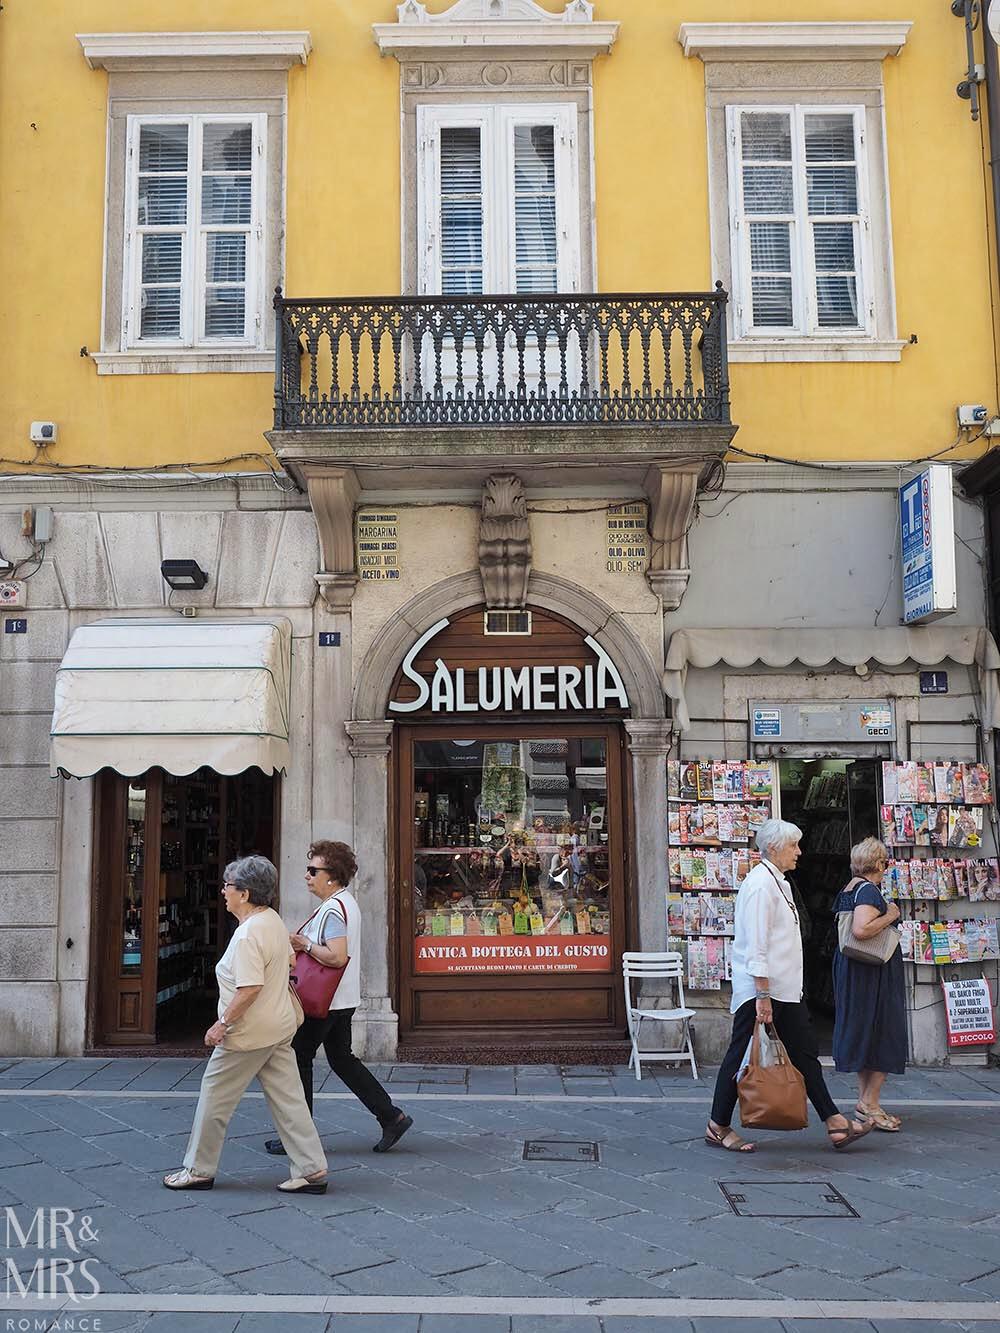 Trieste guide - Trieste salumeria